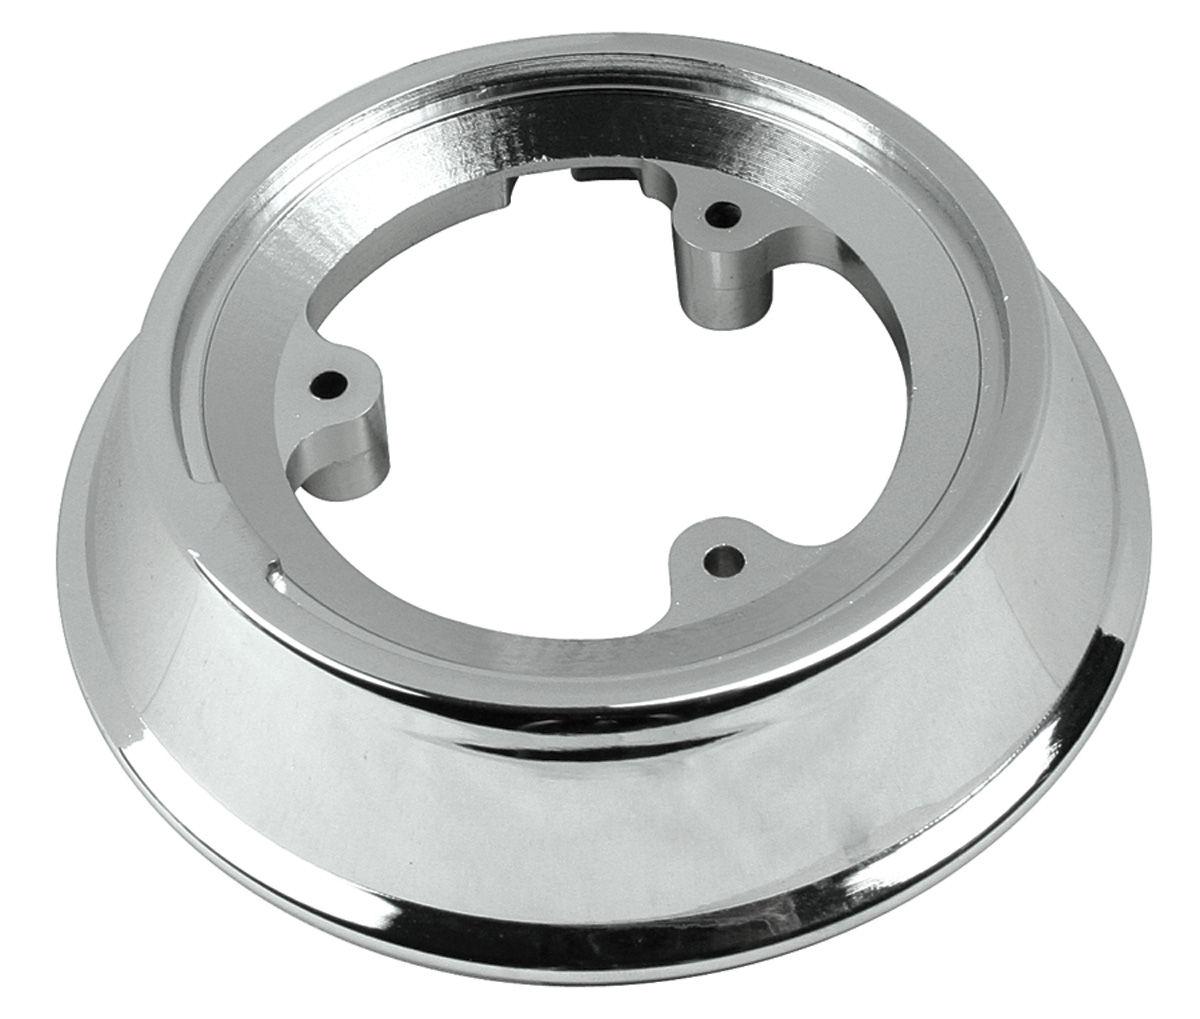 Photo of LeMans Steering Wheel Horn Button Housing (Wood Wheel)